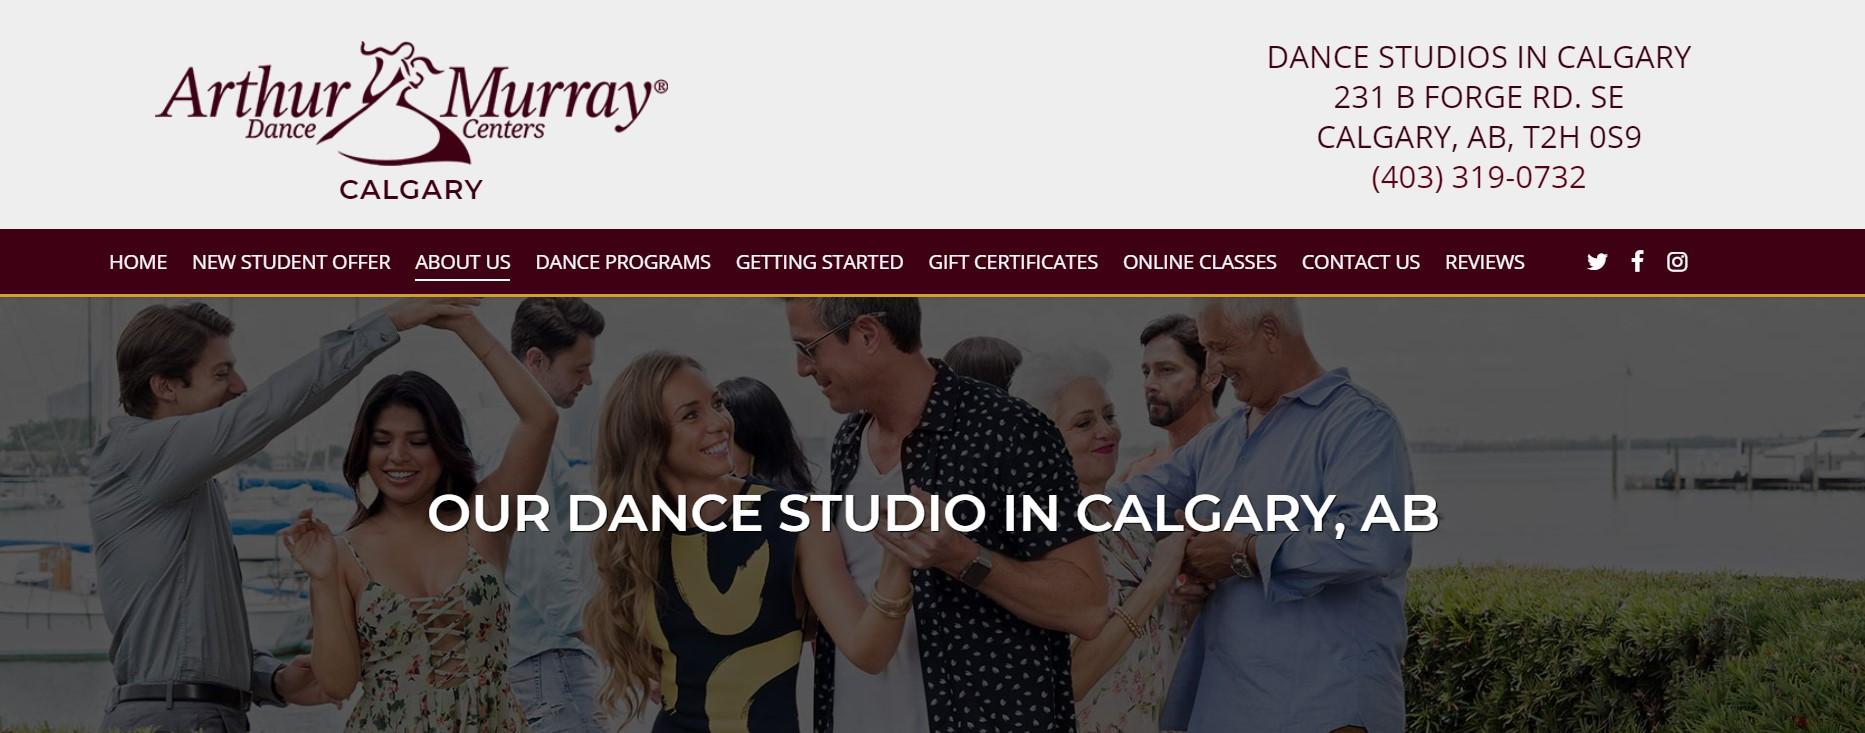 arthur murray dance instructor in calgary